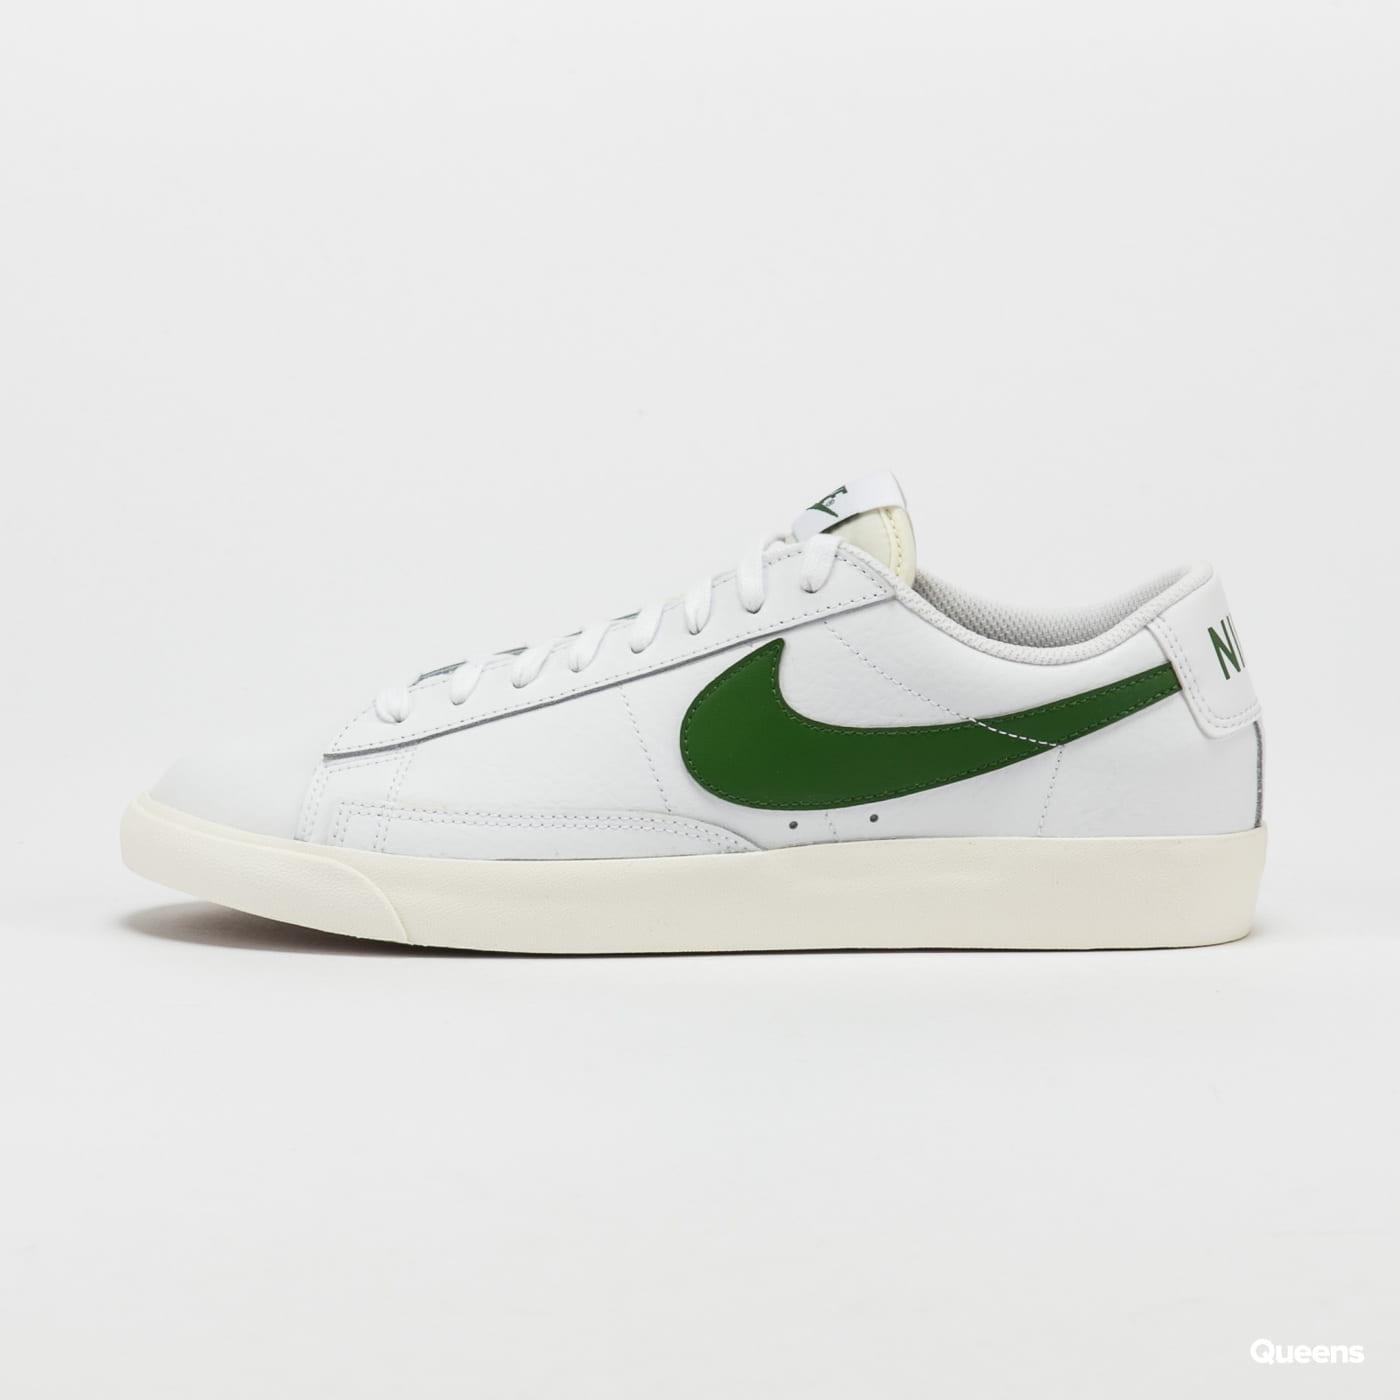 Nike Blazer Low Leather white / forest green - sail